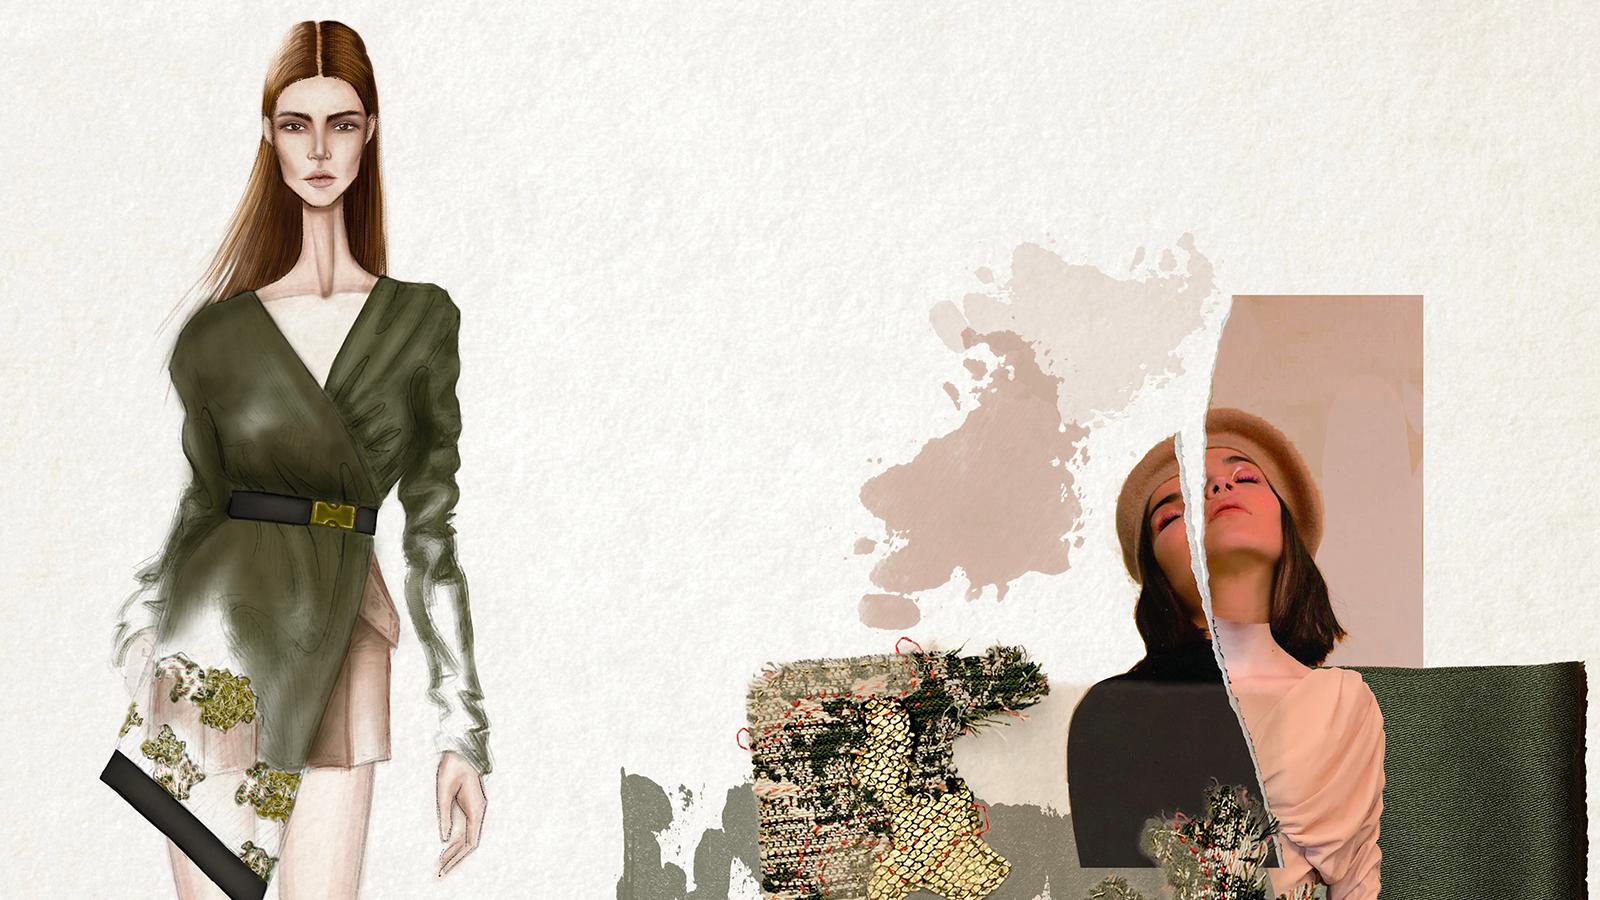 fashion digital illustration | 06 semanas